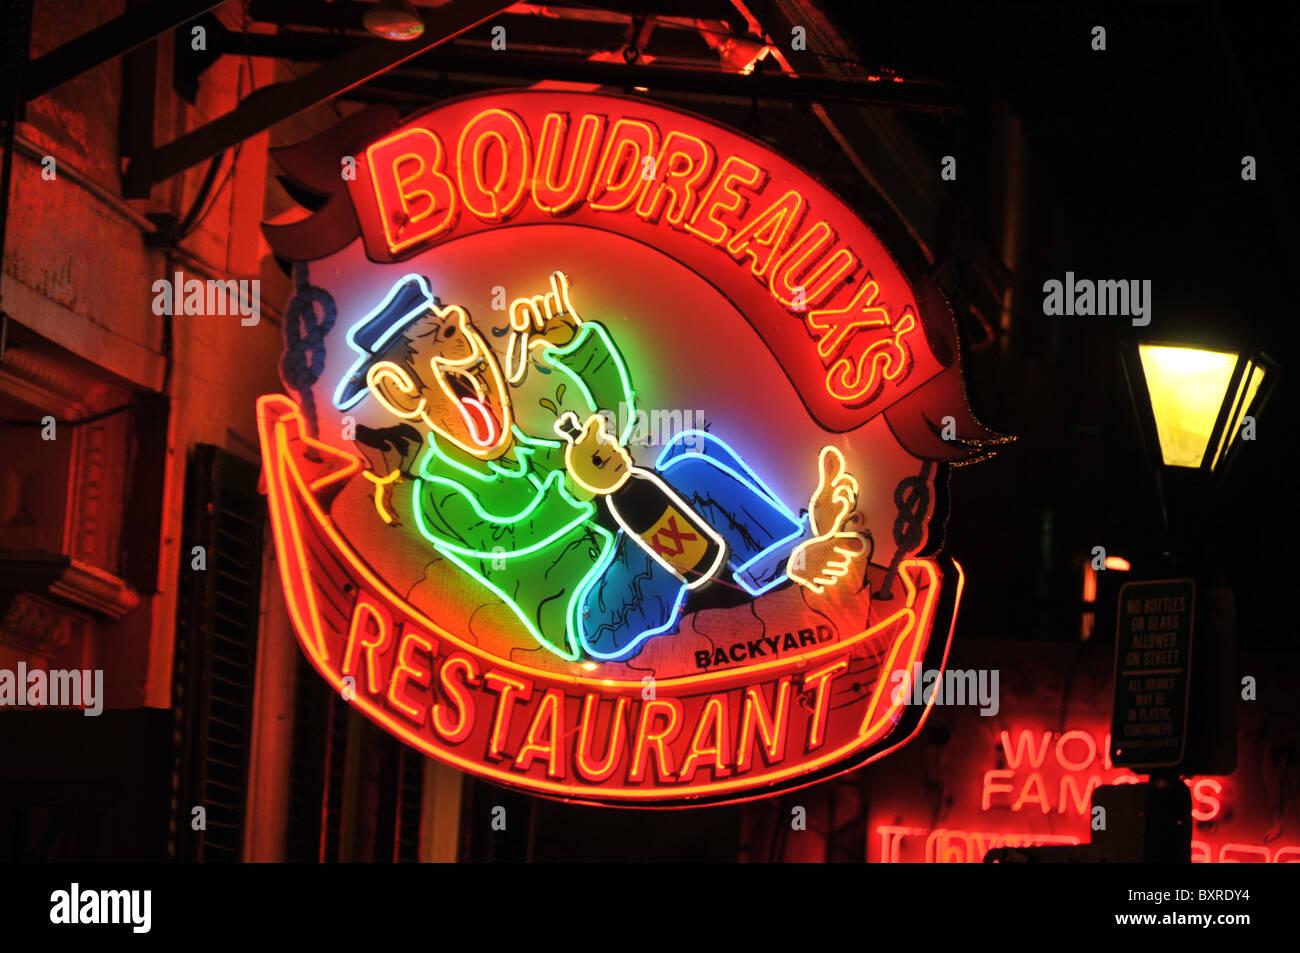 Boudreauxu0027s Backyard Restaurantu0027 Neon Sign On Bourbon Street, French  Quarter, New Orleans, Louisiana